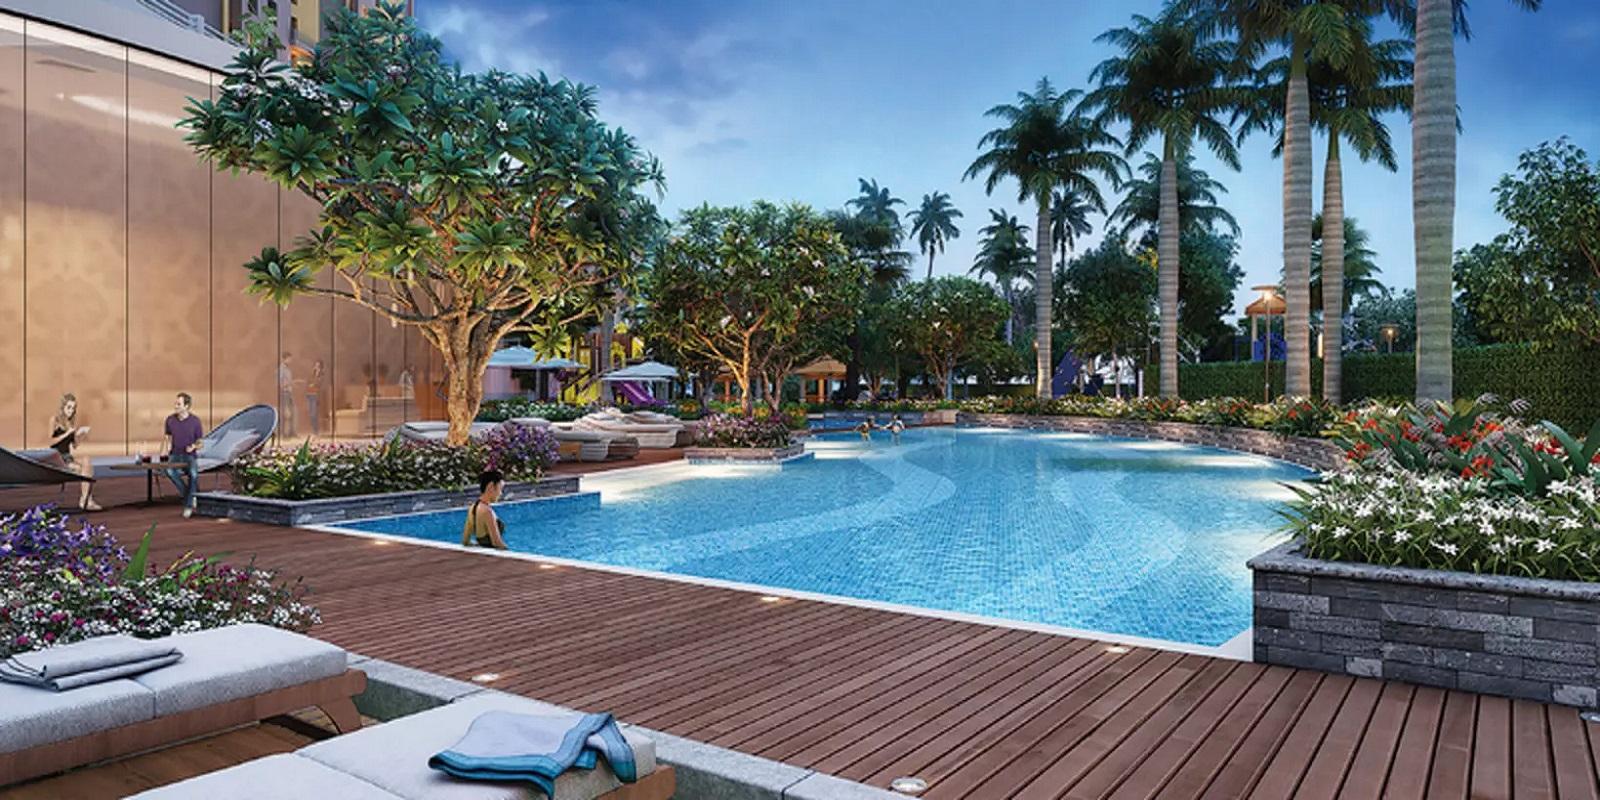 puraniks city reserva amenities features7